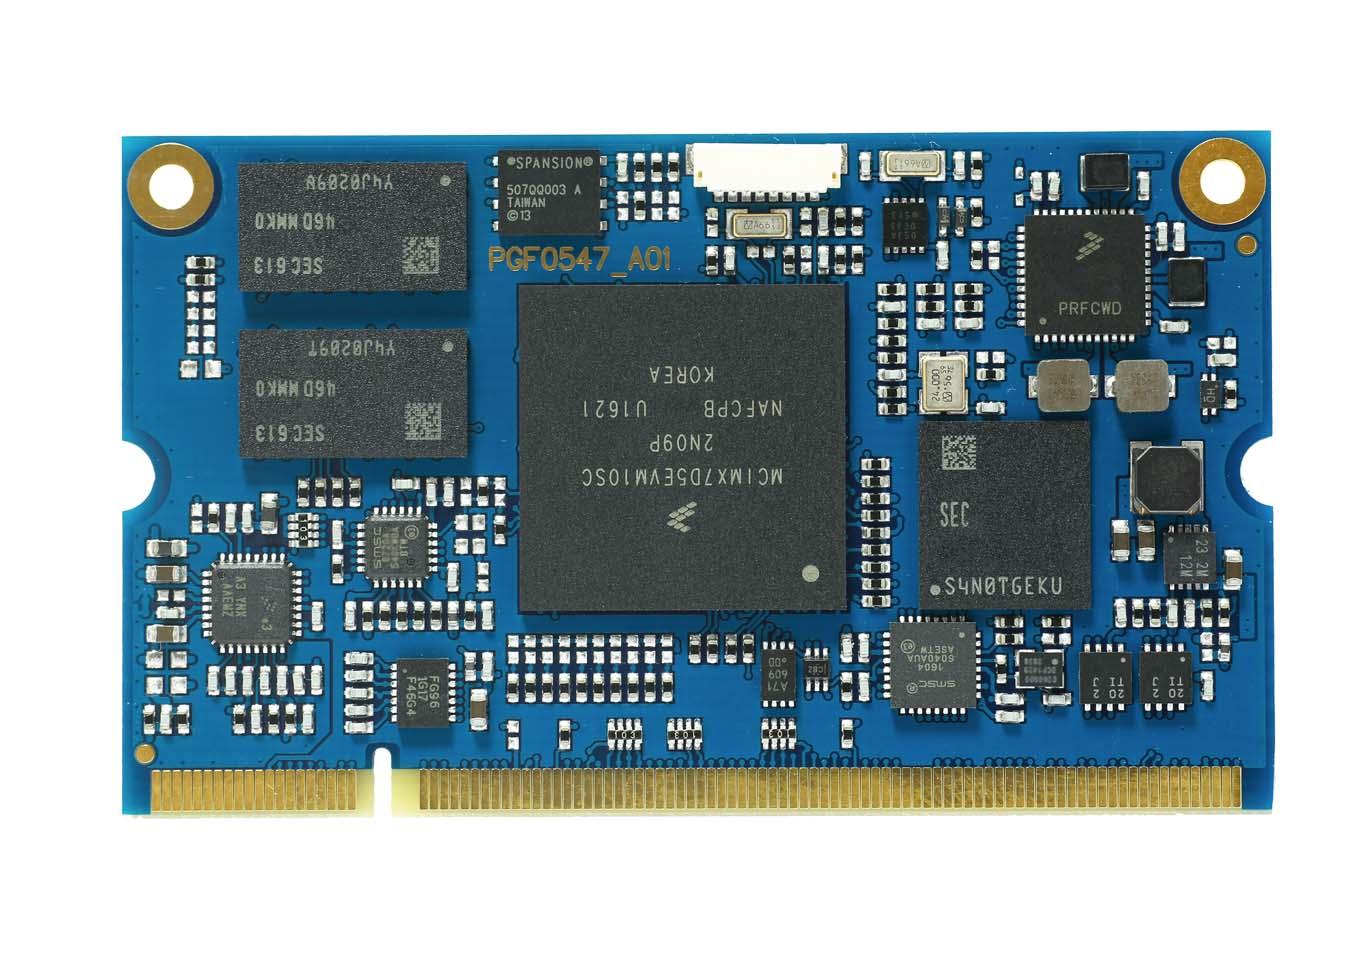 3SM1006 NXP i.MX7 Dual